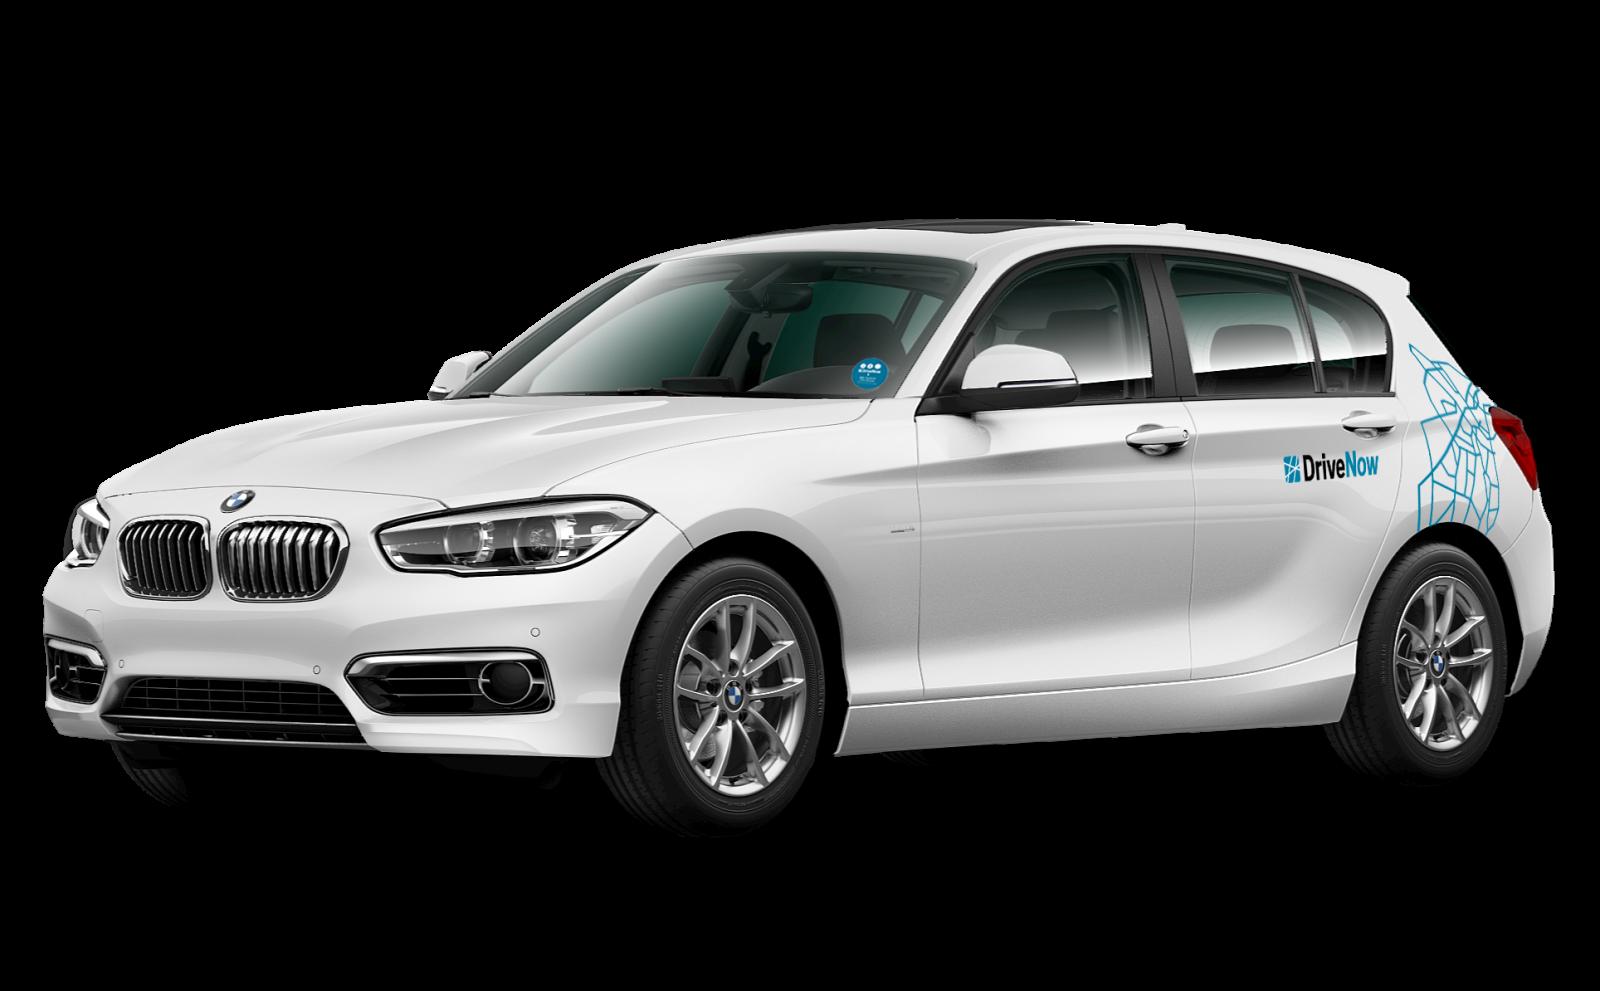 DriveNow_BMW_1SeriesLCI_Silhouette_Transvers_MineralWhite (2)_0